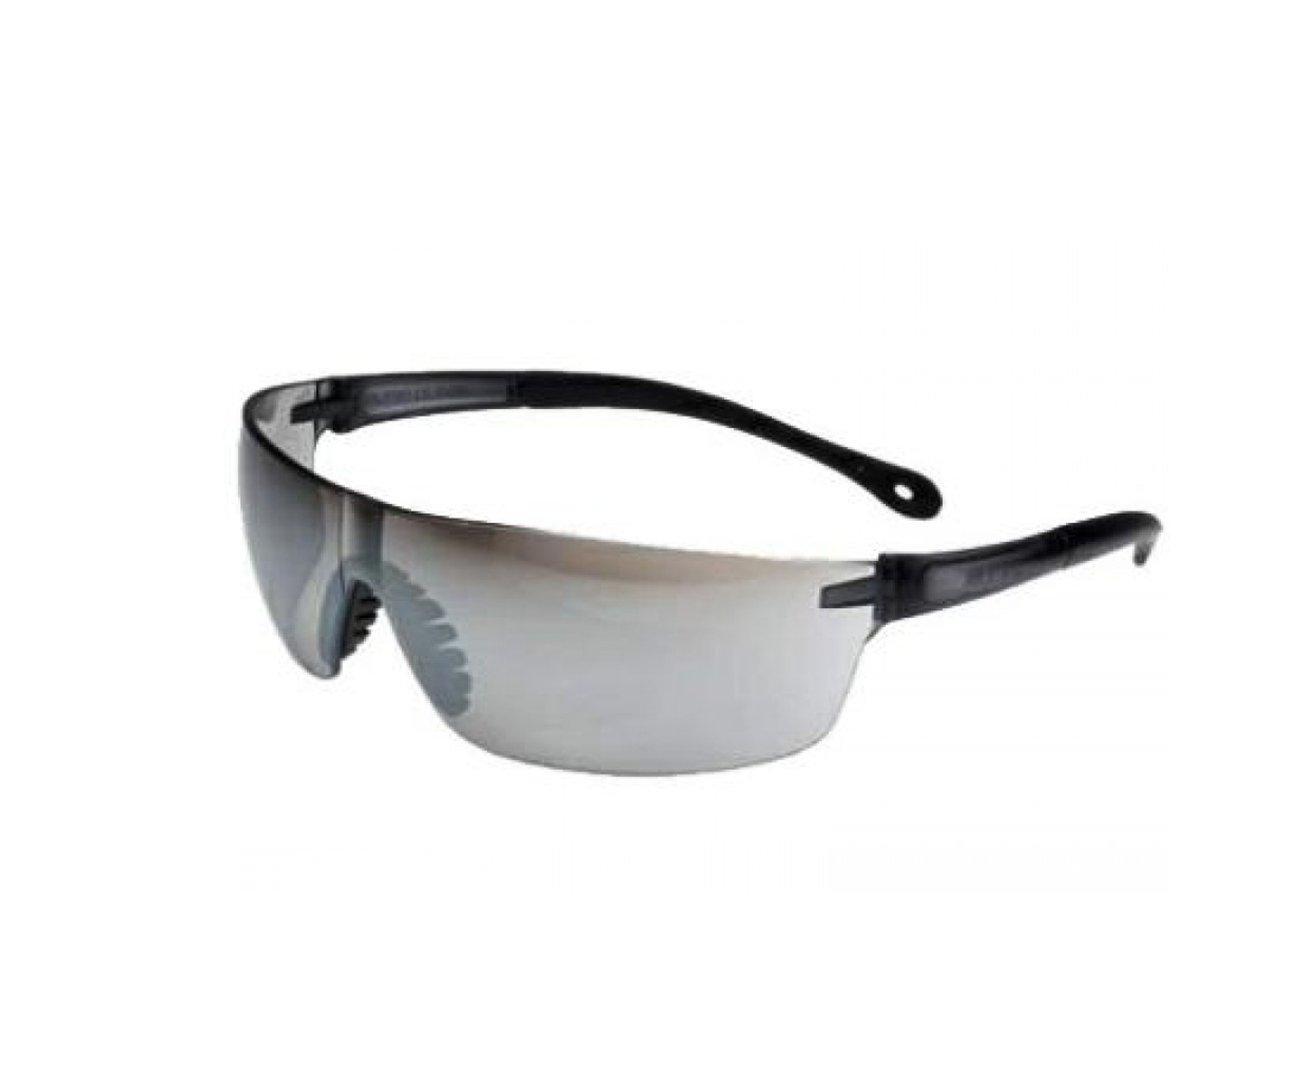 óculos De Sol Proteção Raios Uva E Uvb Pallas Cinza - Kalipso